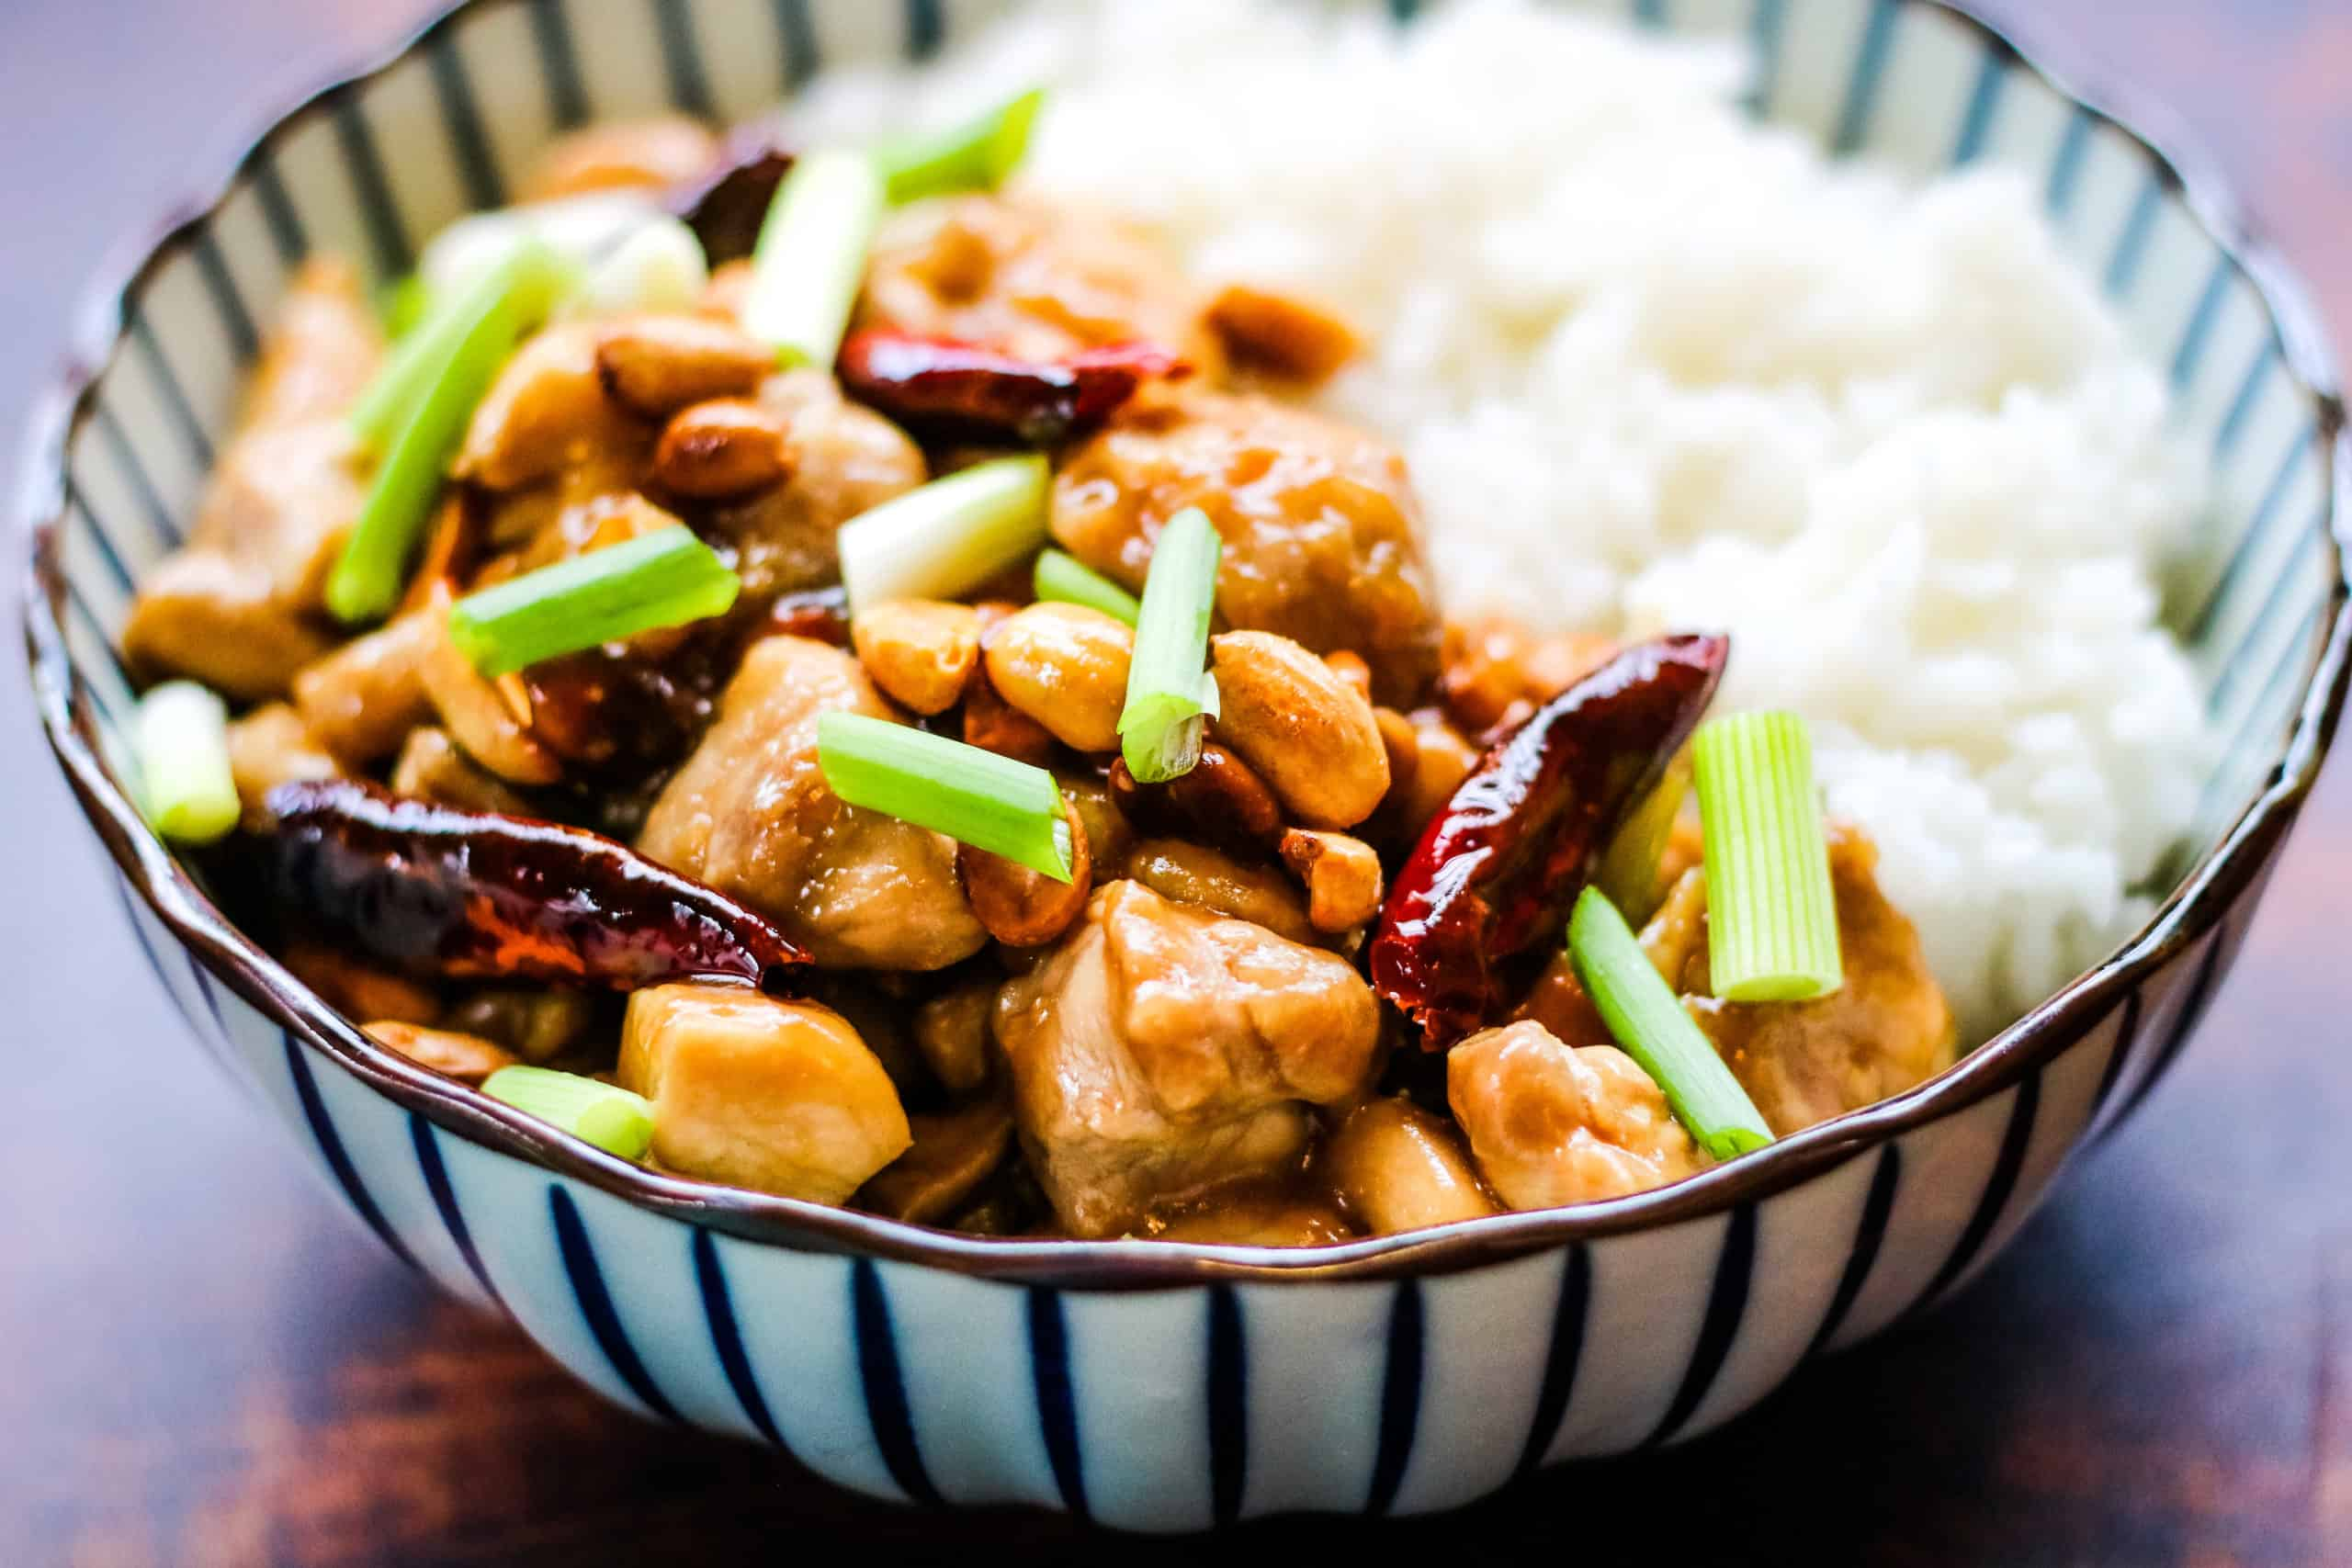 Spicy Sichuan Kung Pao Chicken